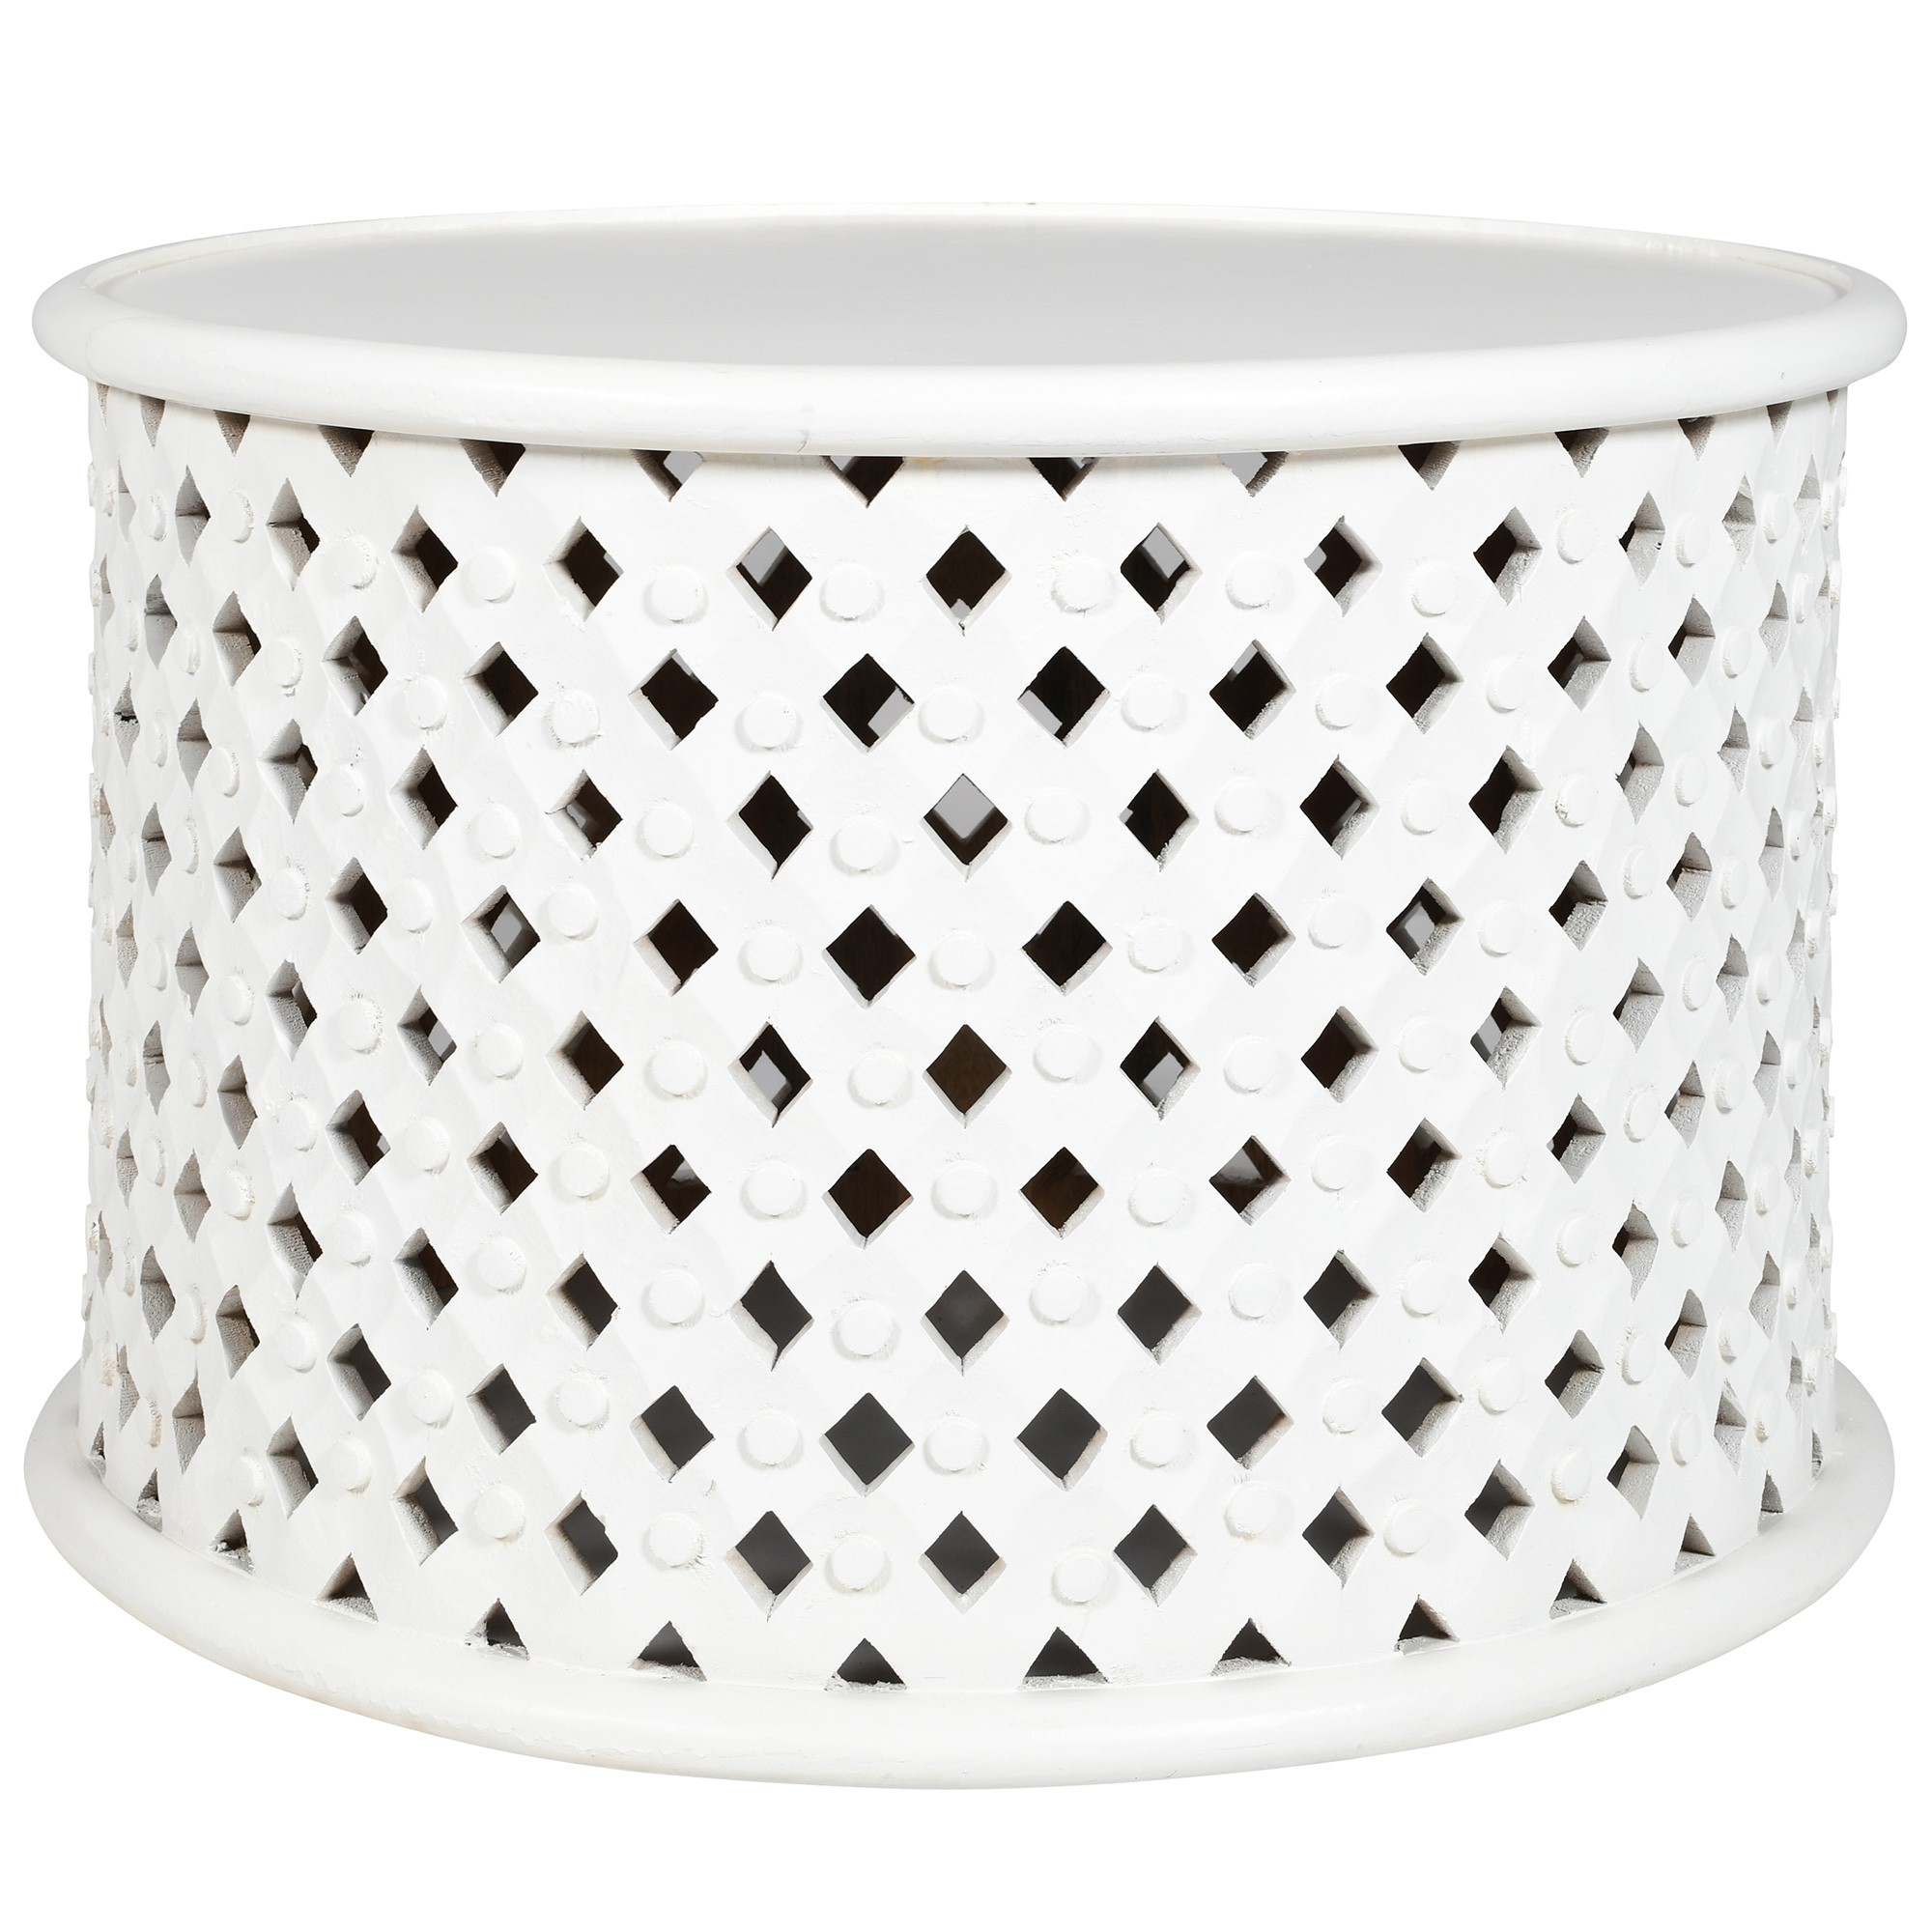 Jaipur Mango Wood Round Coffee Table, 76cm, White